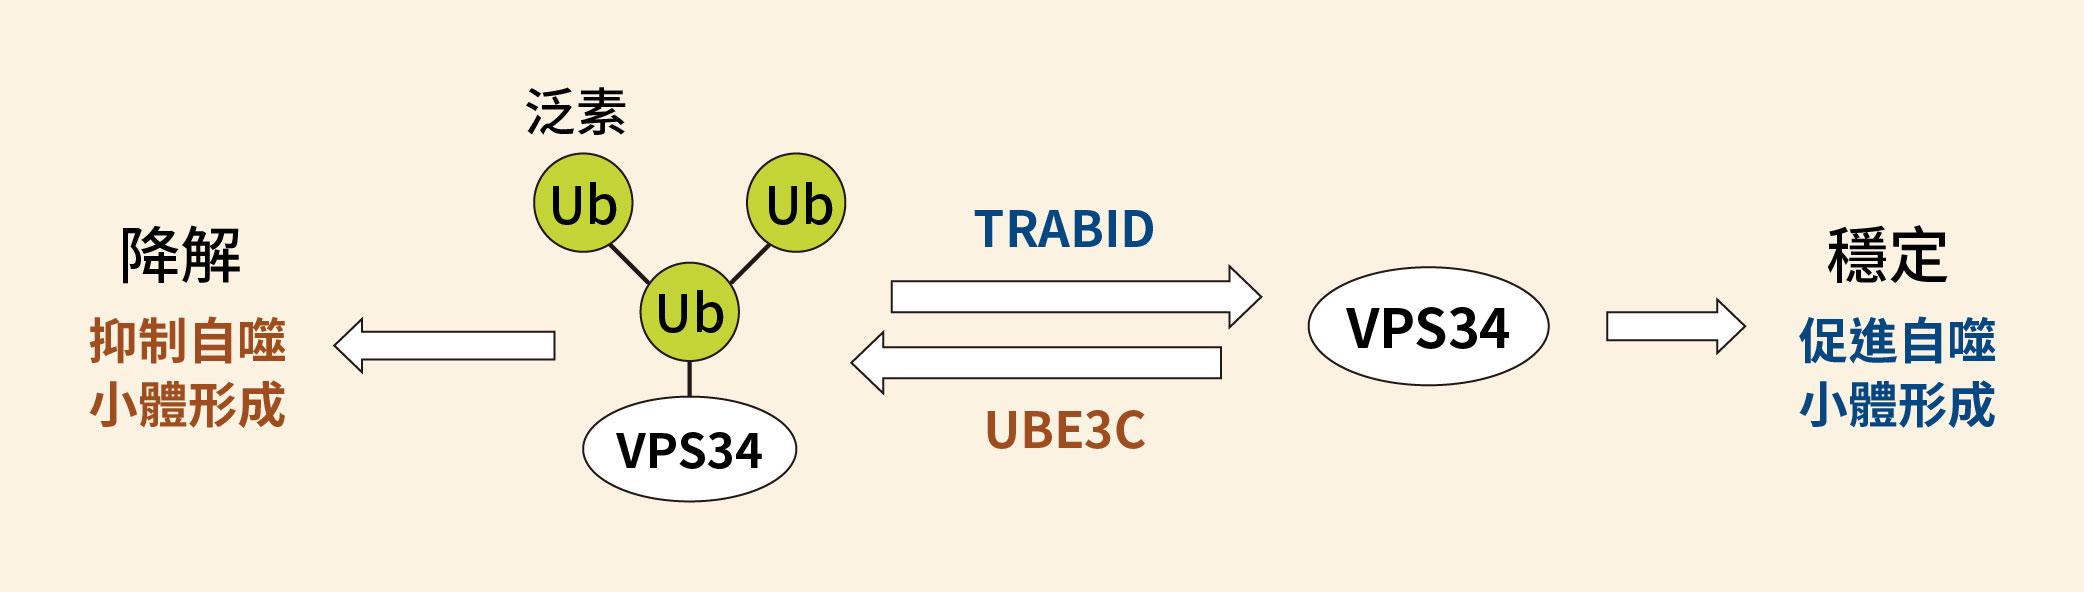 TRABID 與 UBE3C 共同調控 VPS34 的示意圖,TRABID 會促進細胞自噬作用;反之,UBE3C 則會抑制細胞自噬。圖│研之有物(資料來源│陳瑞華)